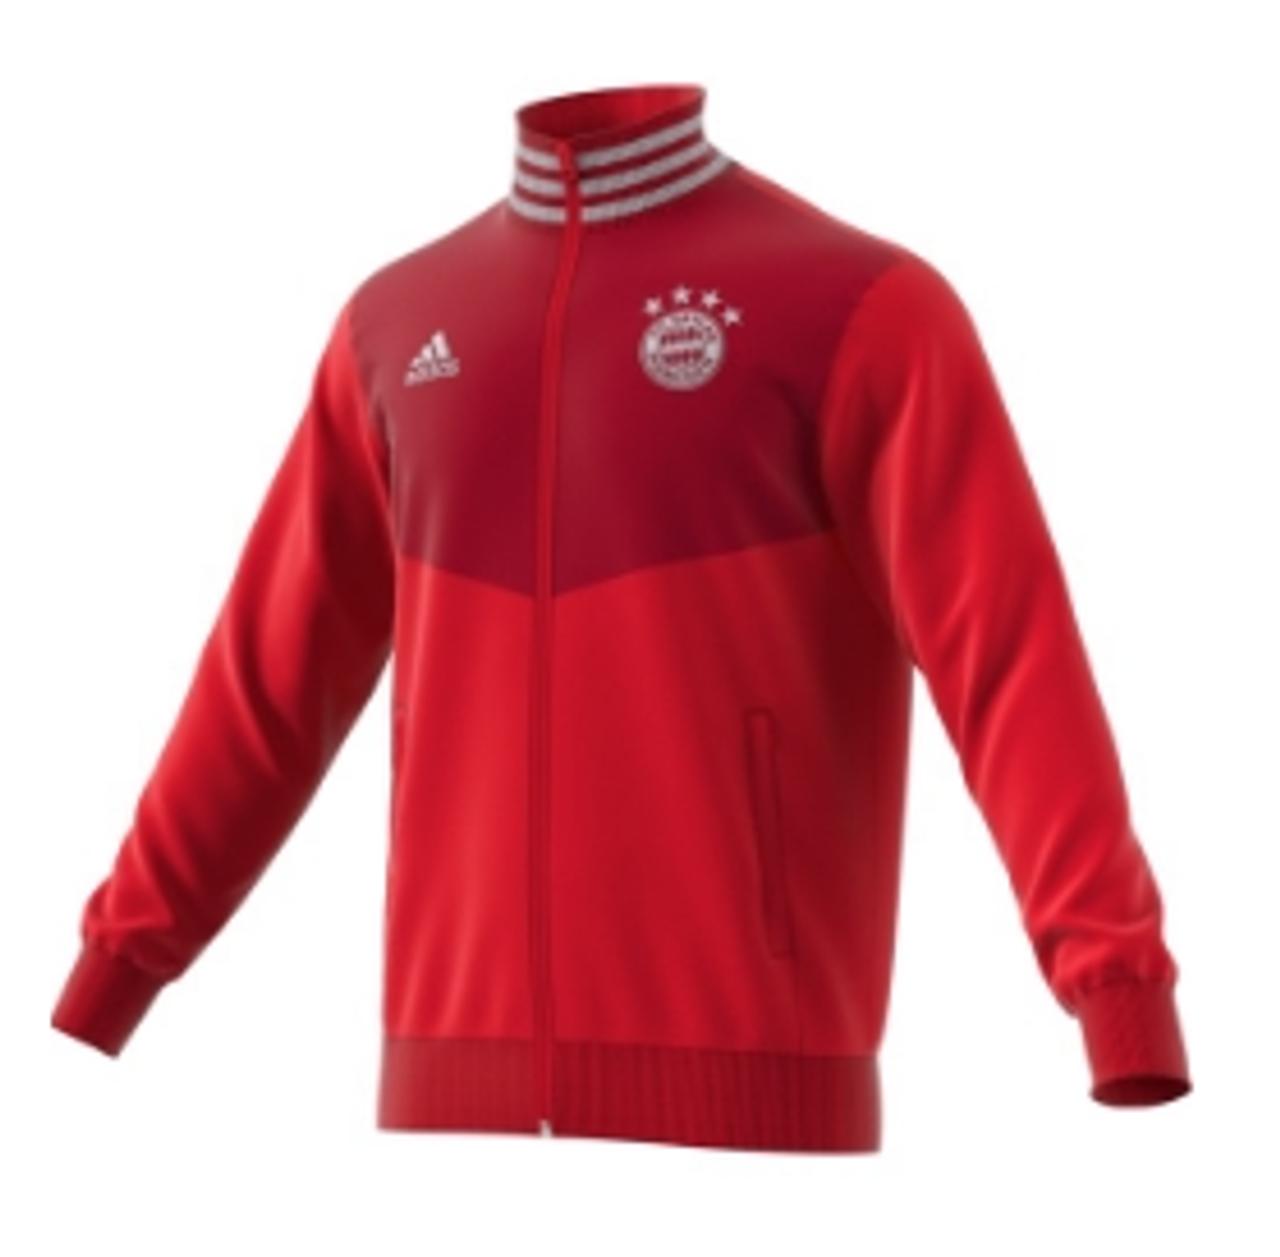 Adidas FC Bayern Munich 3 Stripe Track Top Red (123019)